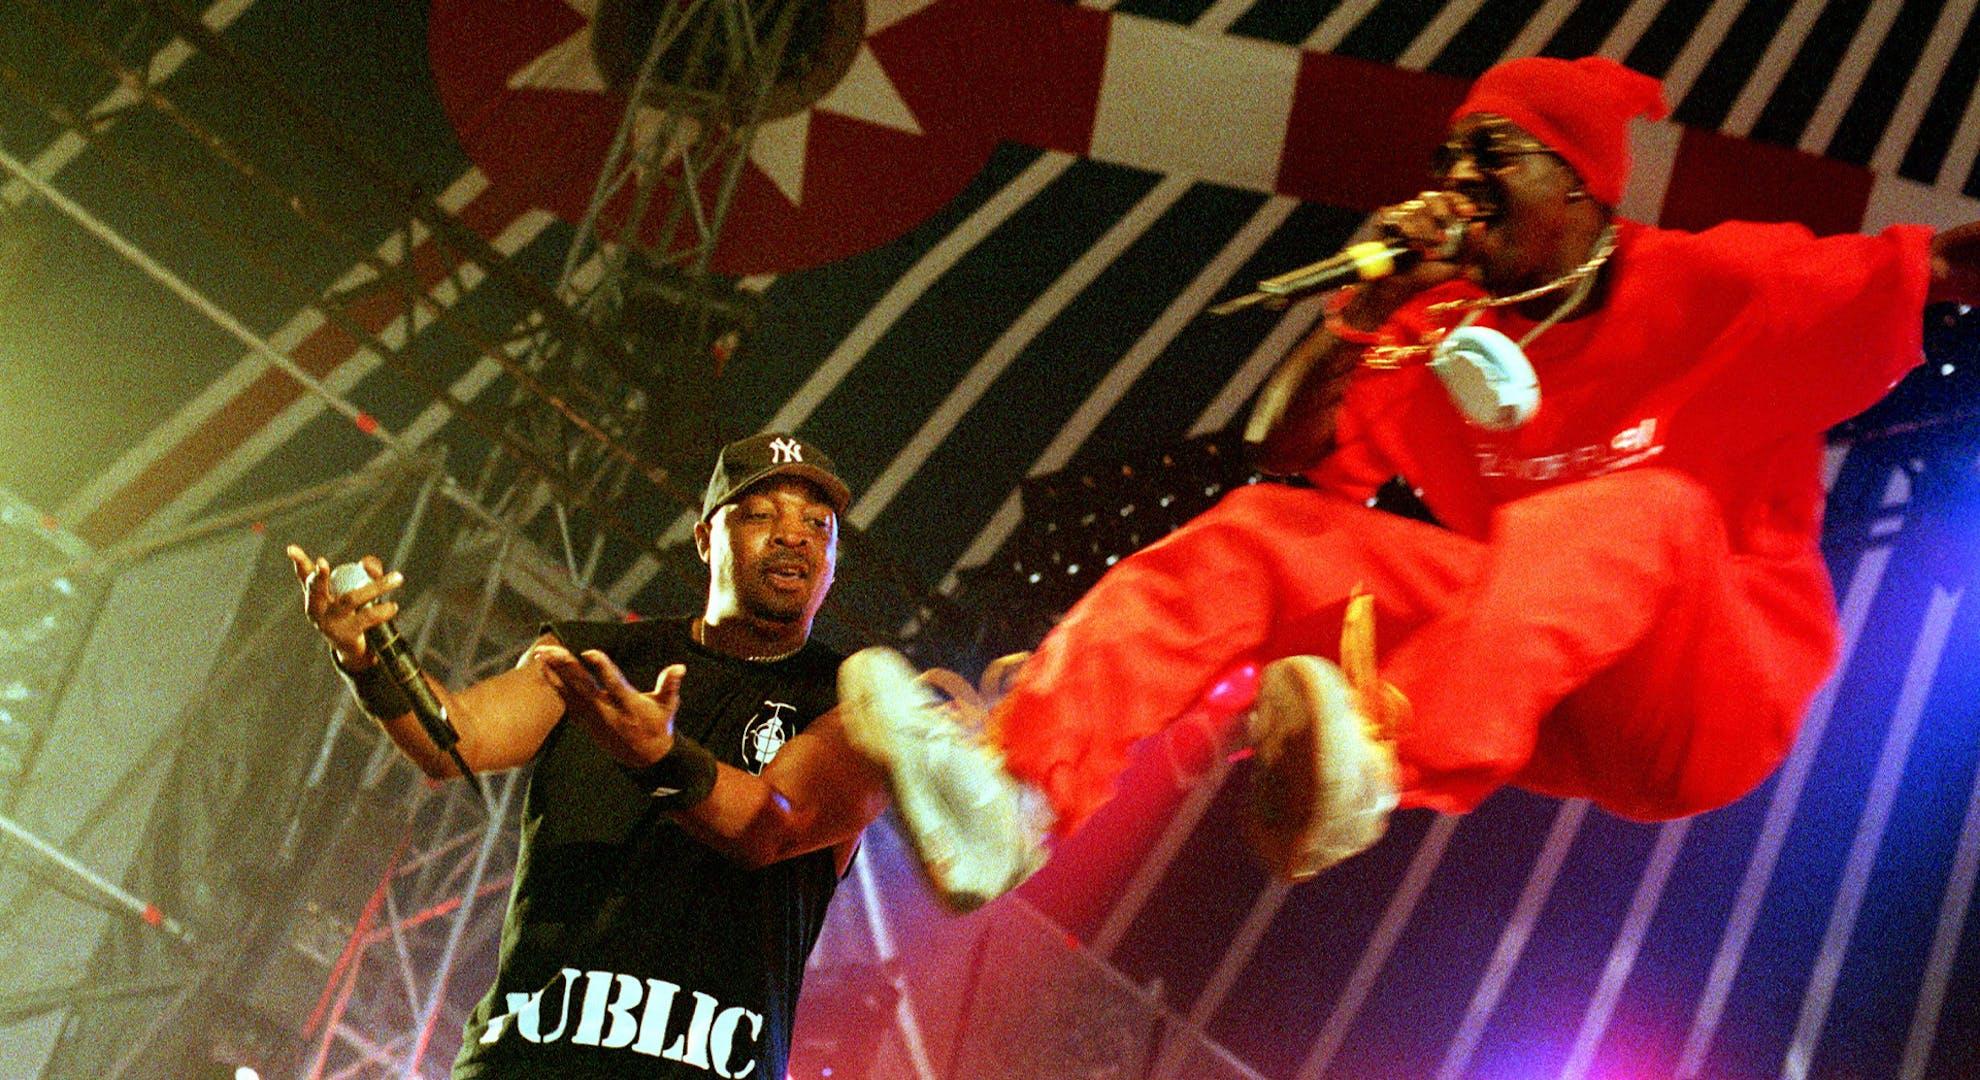 Chuck D & Flava Fla perform in the Netherlands circa 2000.